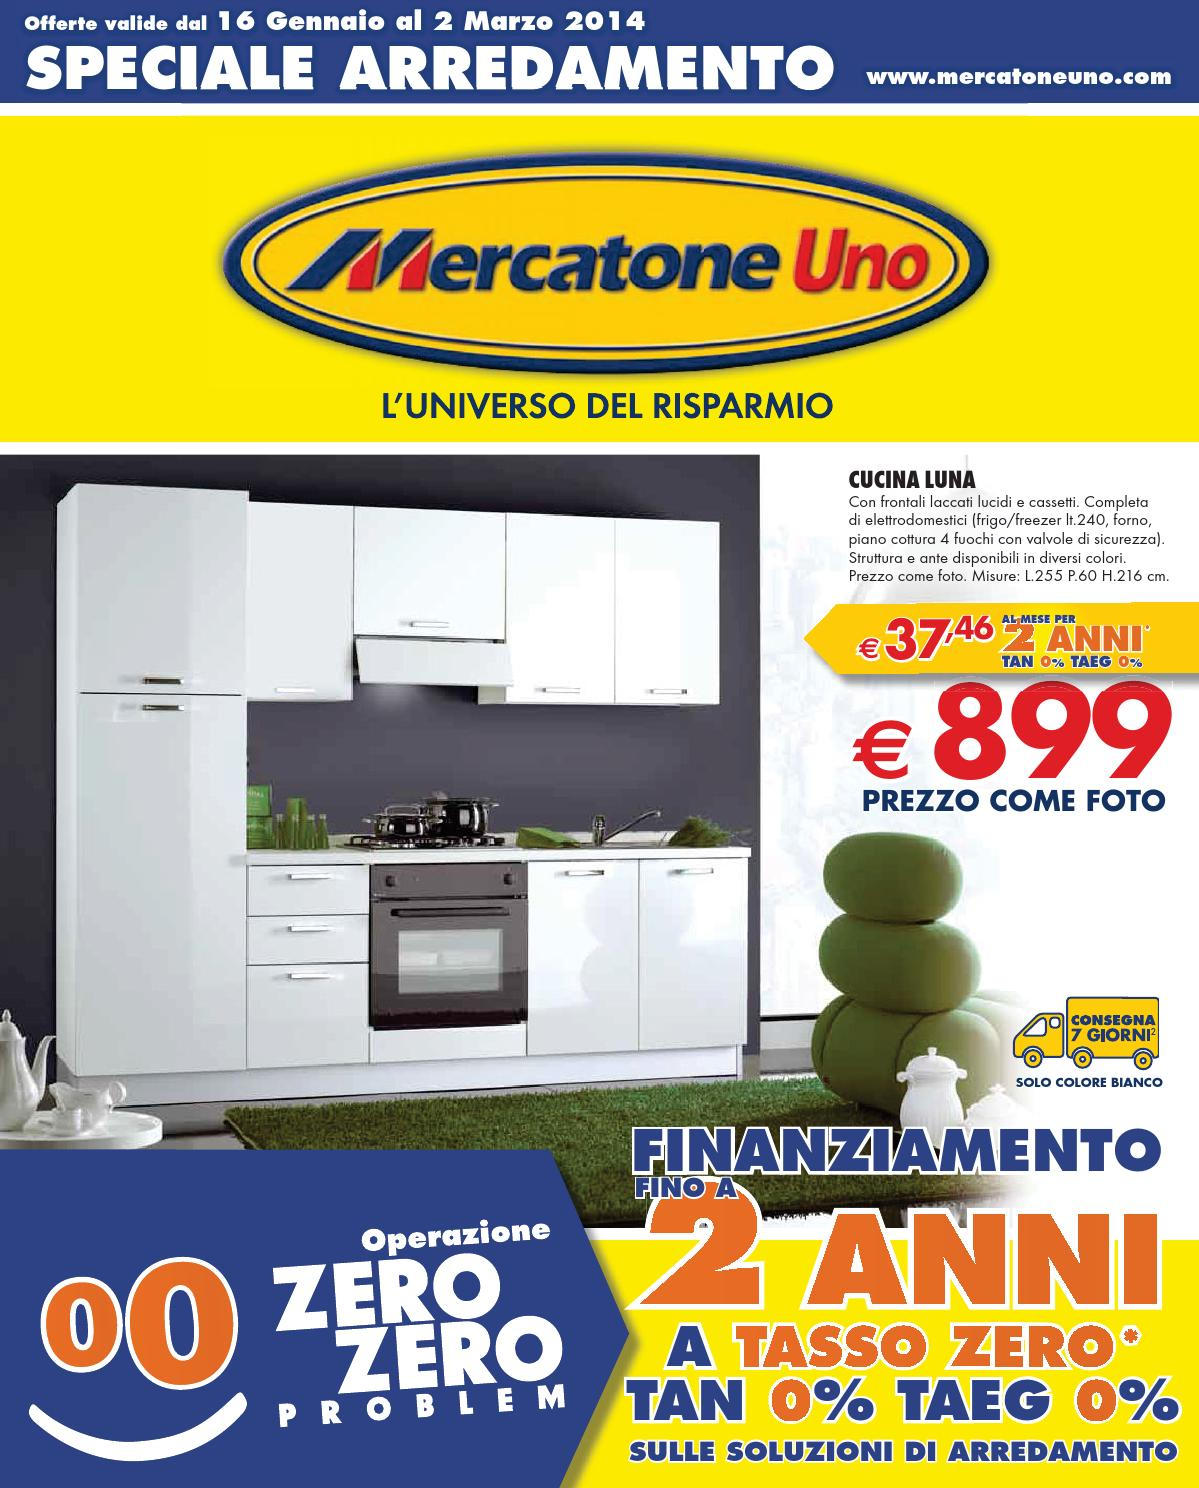 Cassettiere Interne Per Armadi Mercatone Uno.Mercatoneuno 2mar By Volavolantino Issuu